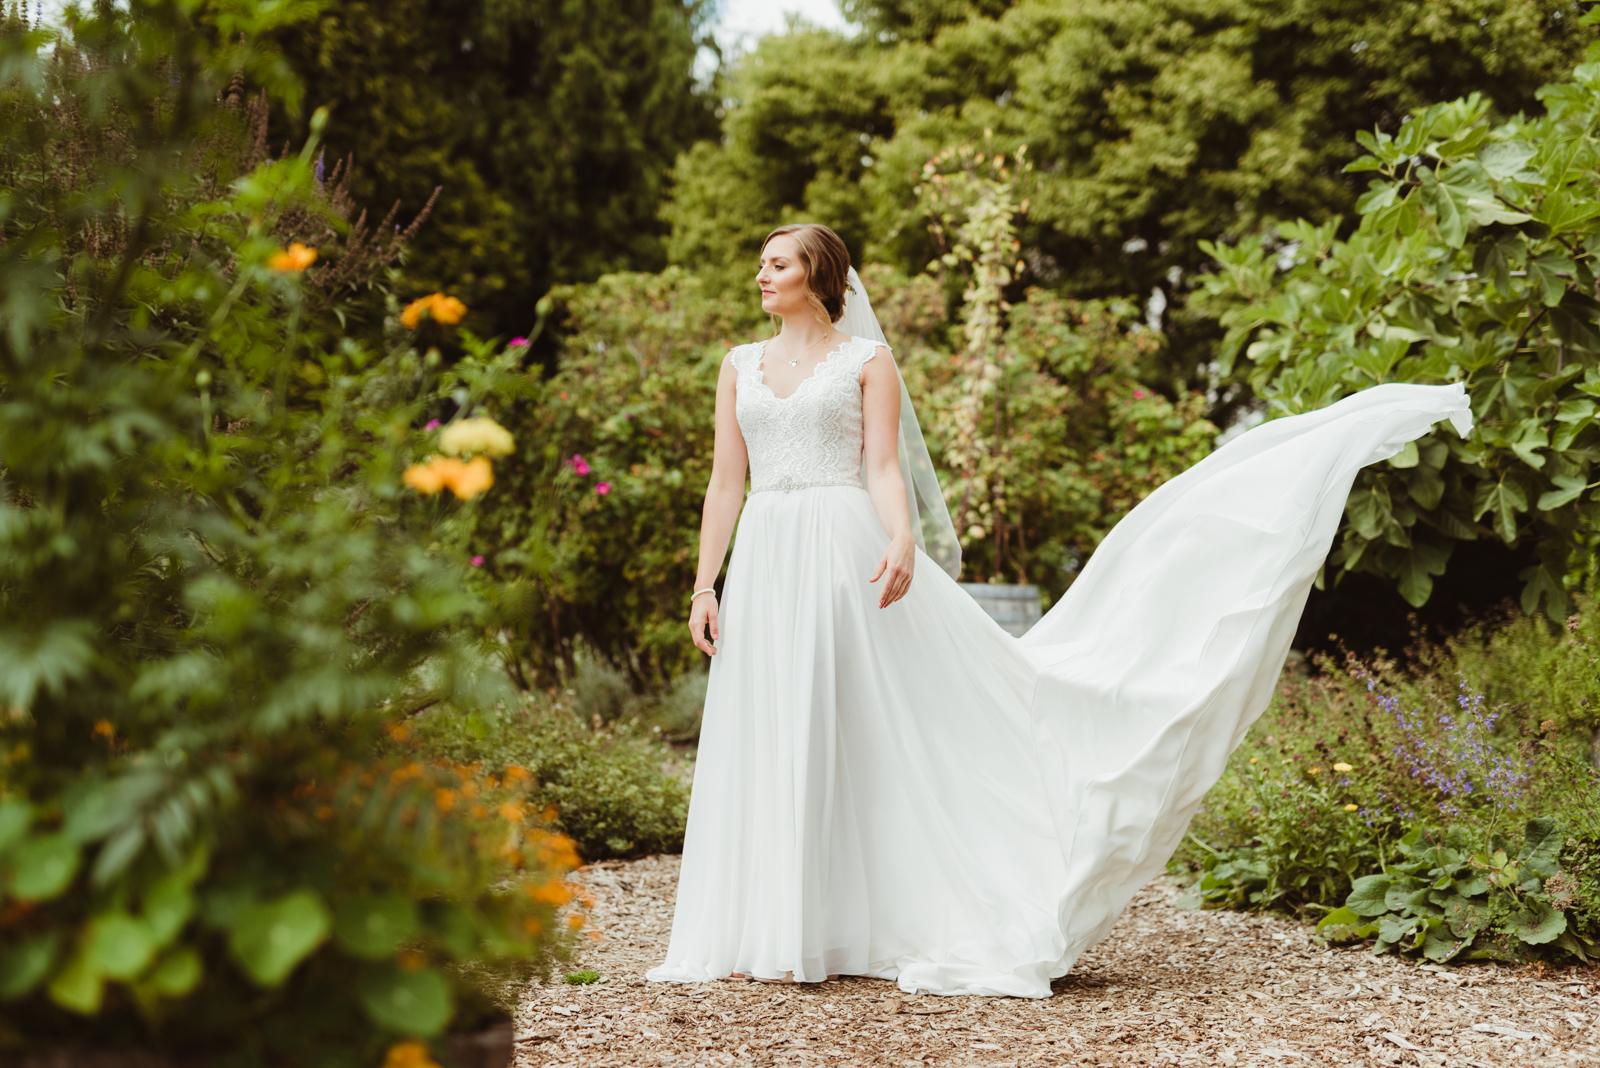 Bridal portrait with wind swept dress